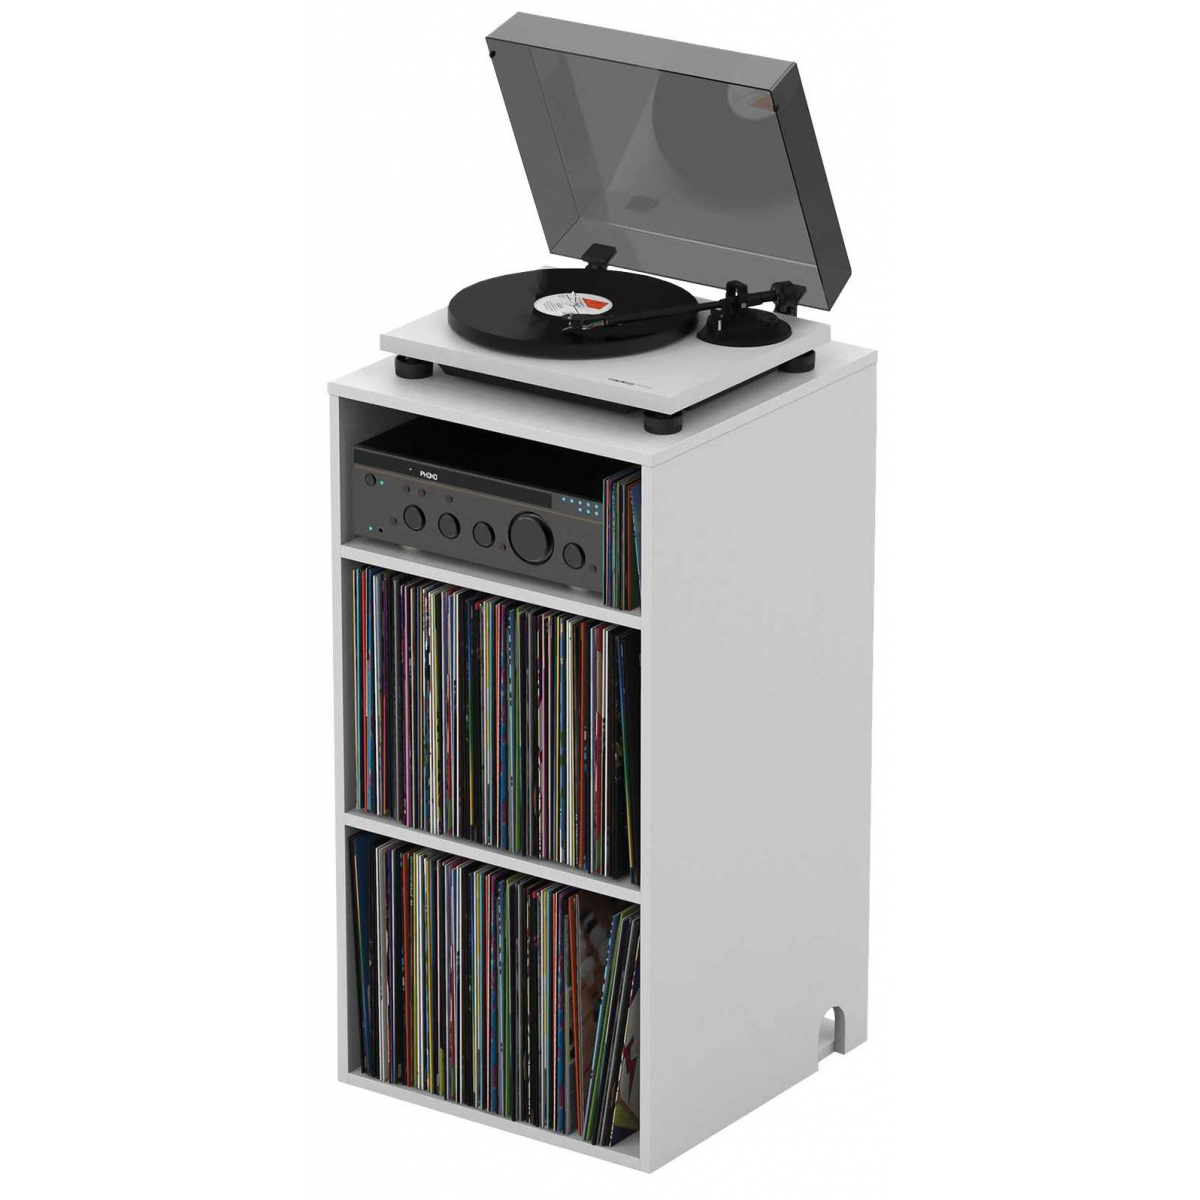 Meubles et pochettes de disques - Glorious DJ - MODULAR MIX RACK WHITE